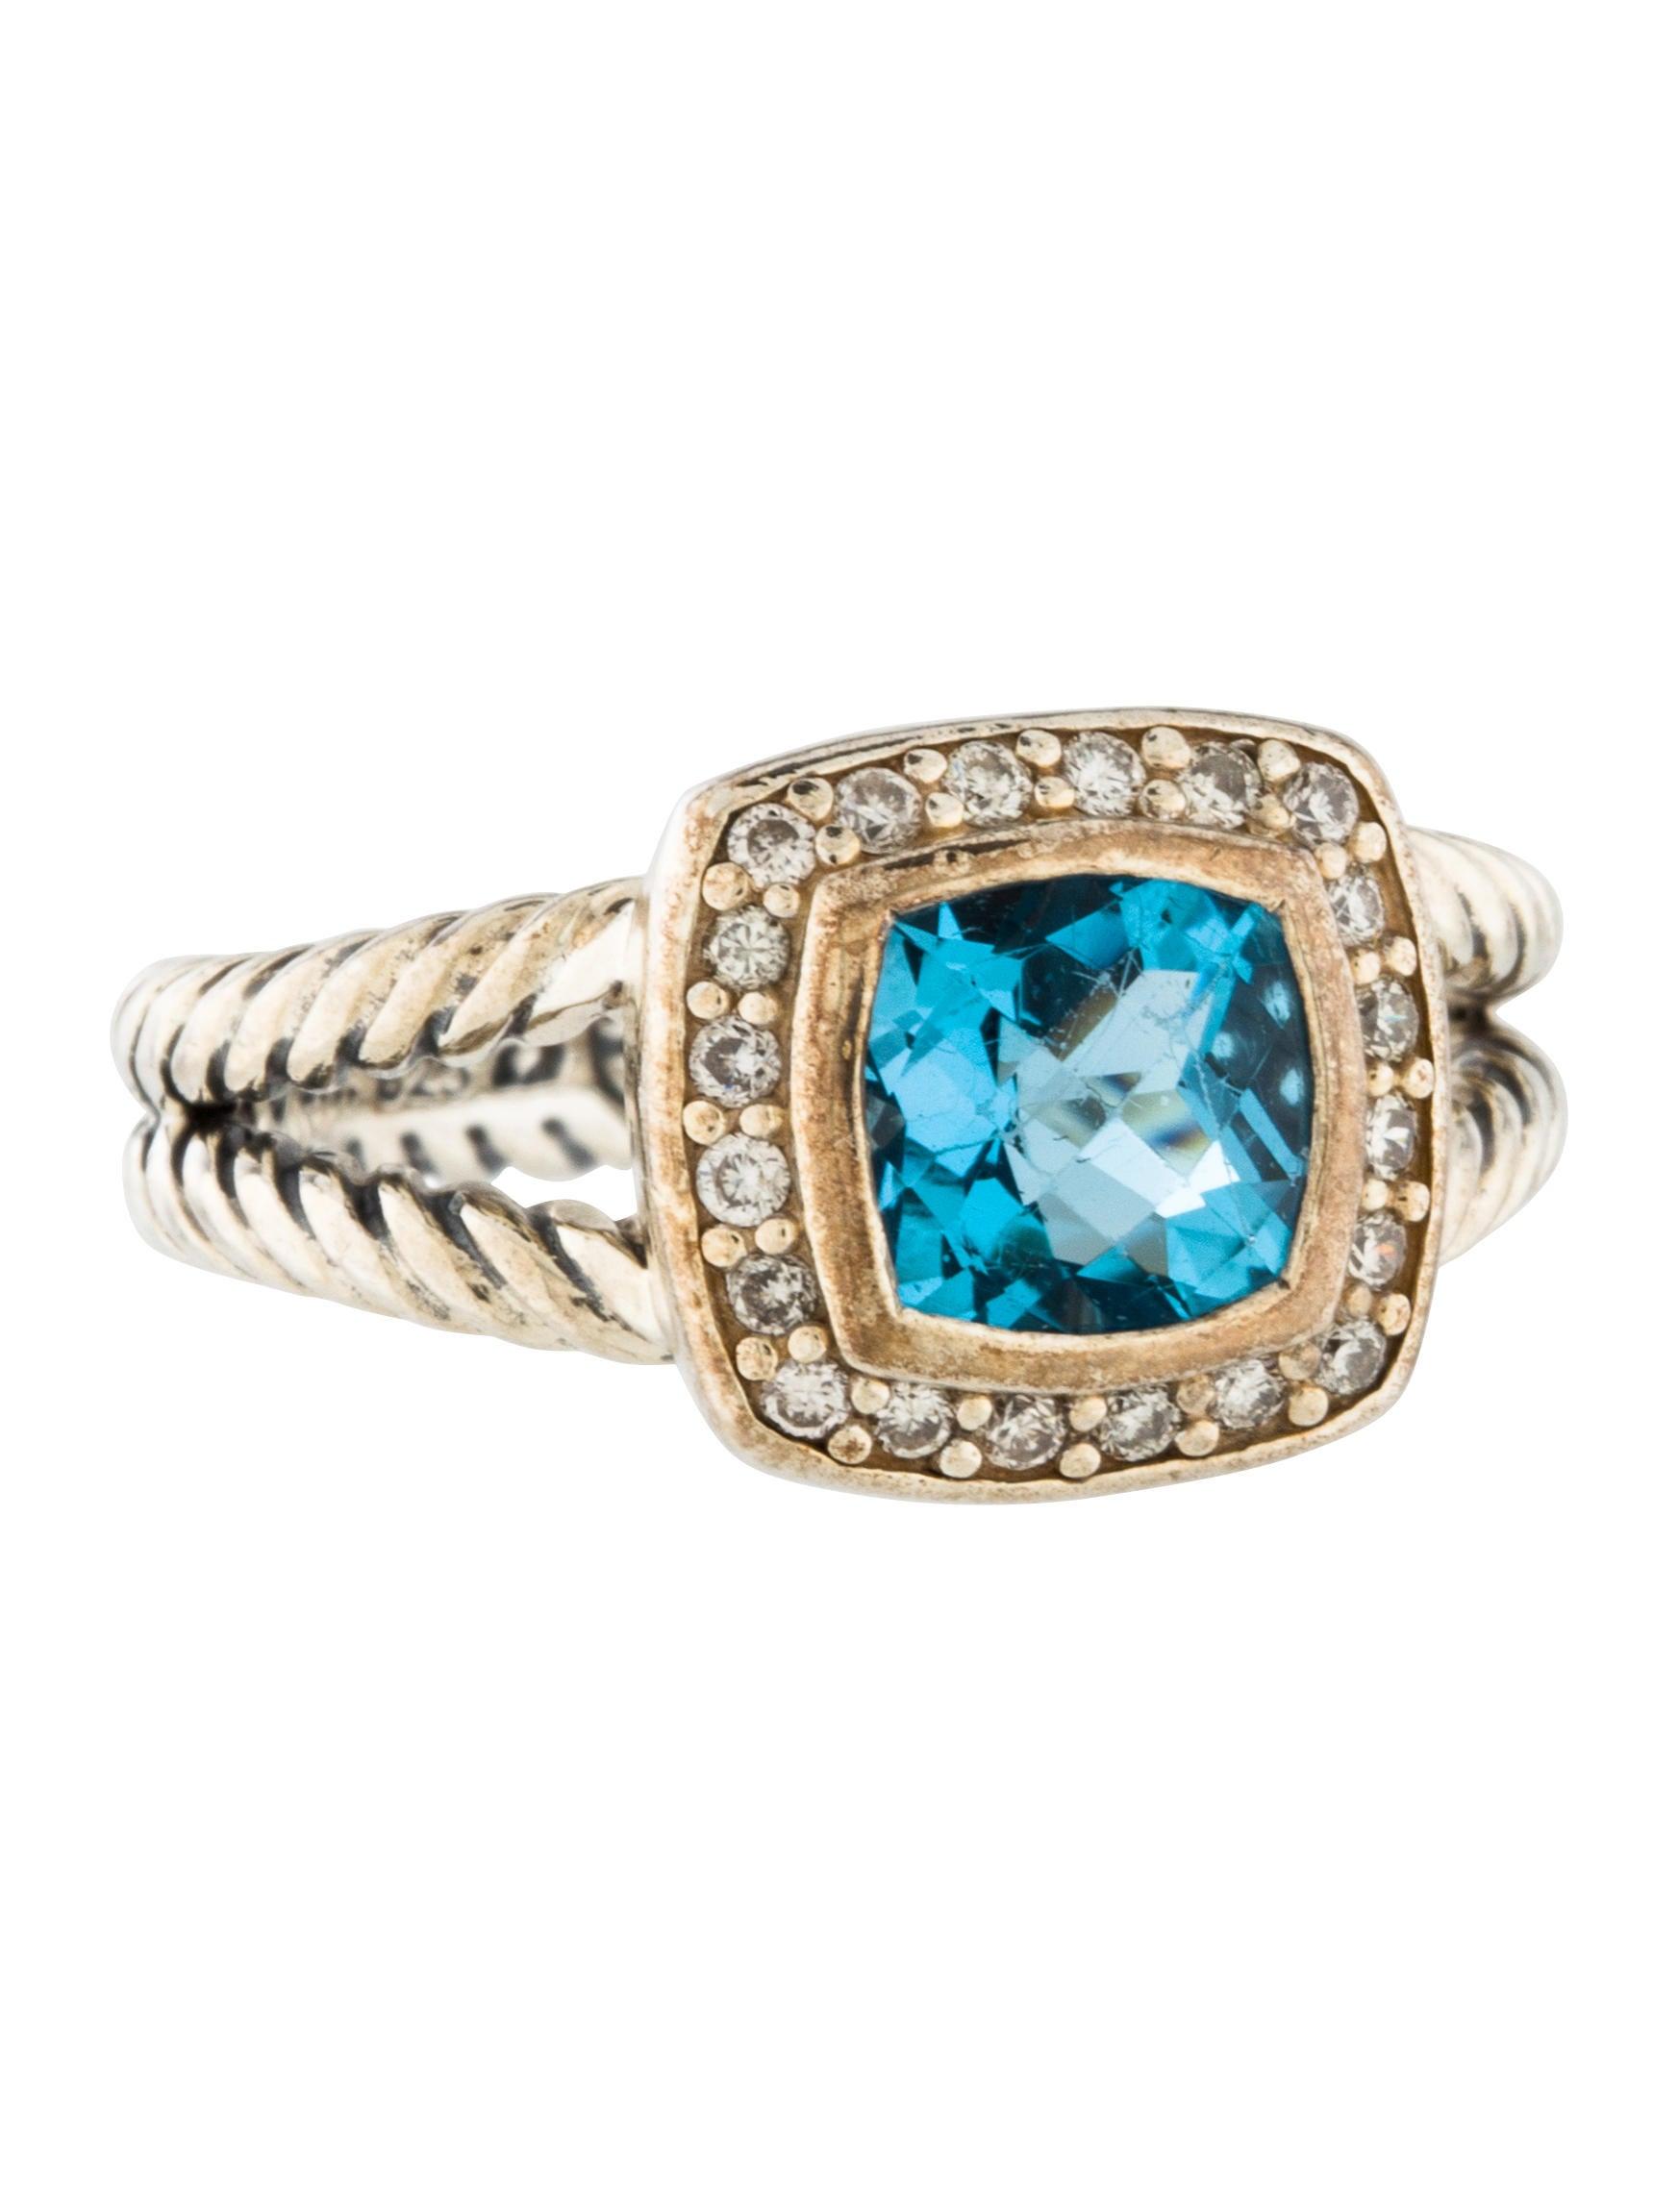 David Yurman Diamond Ring Sale